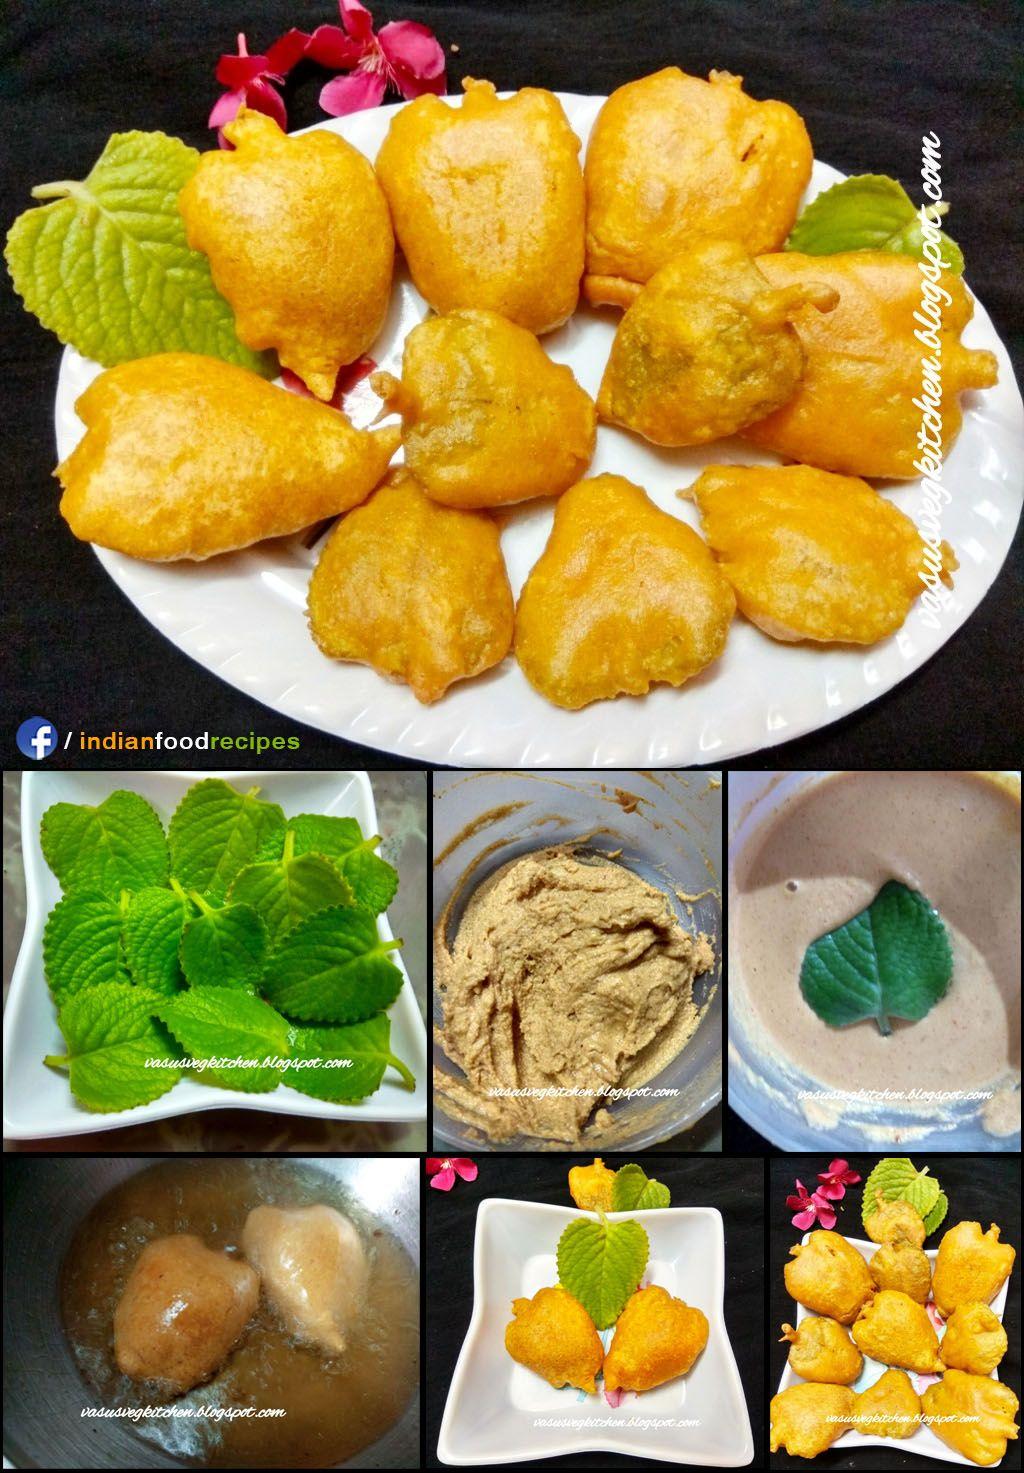 Ajwain Patee Ke Pakode In 10 Minutes Recipe Step By Step Recipes Indian Food Recipes Recipe Steps